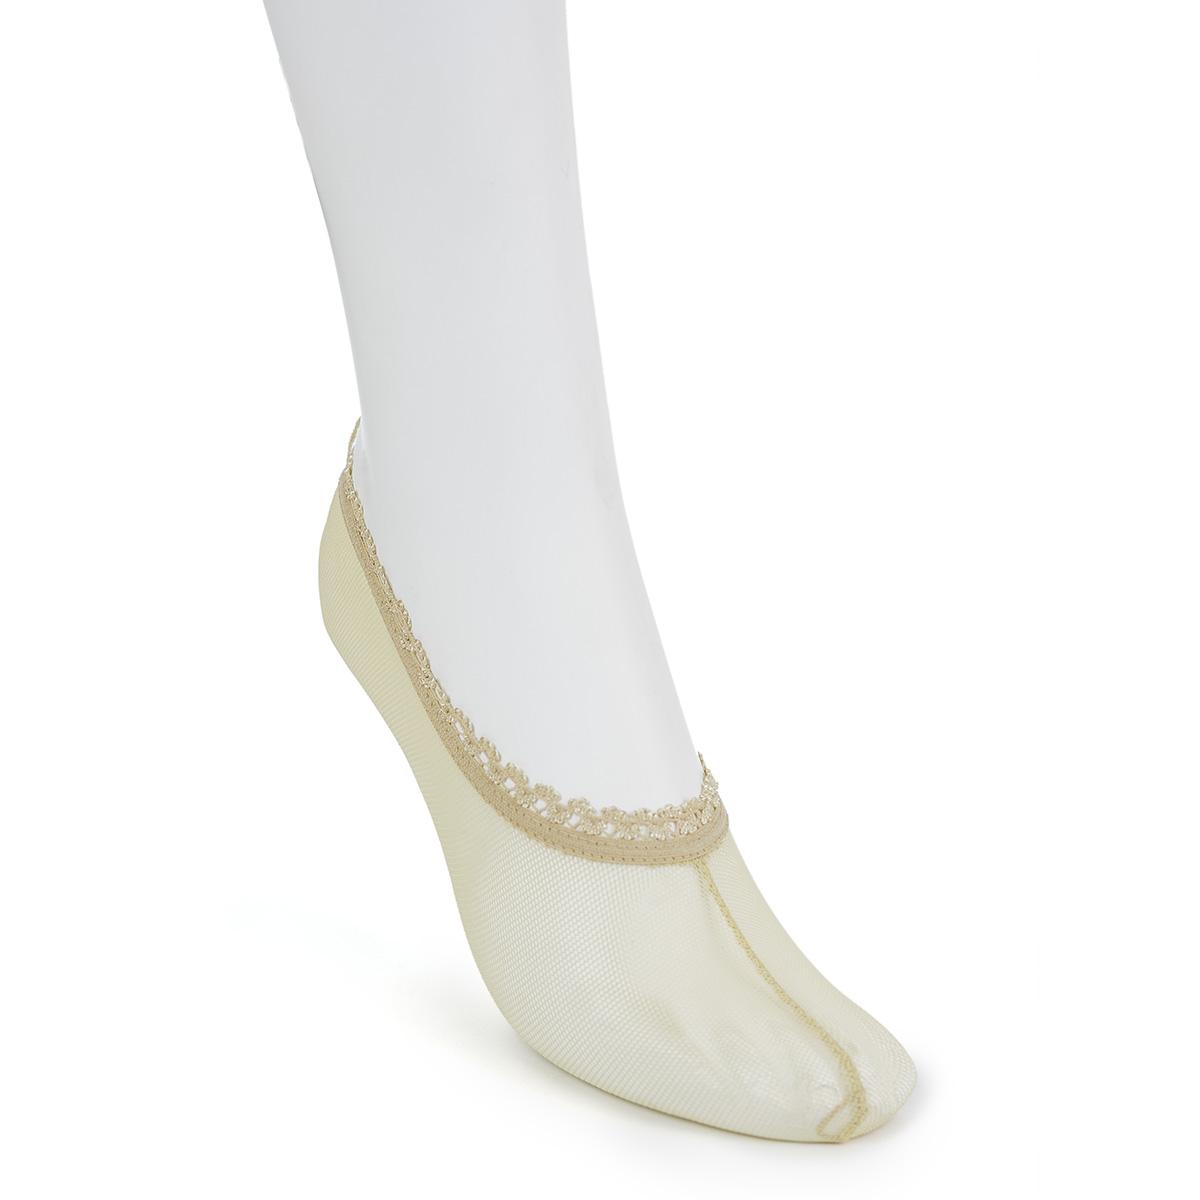 Следки Finox, размер 36-41Носки и чулки<br><br><br>Тип: Жен. носки<br>Размер: 36-41<br>Материал: Смесовая ткань